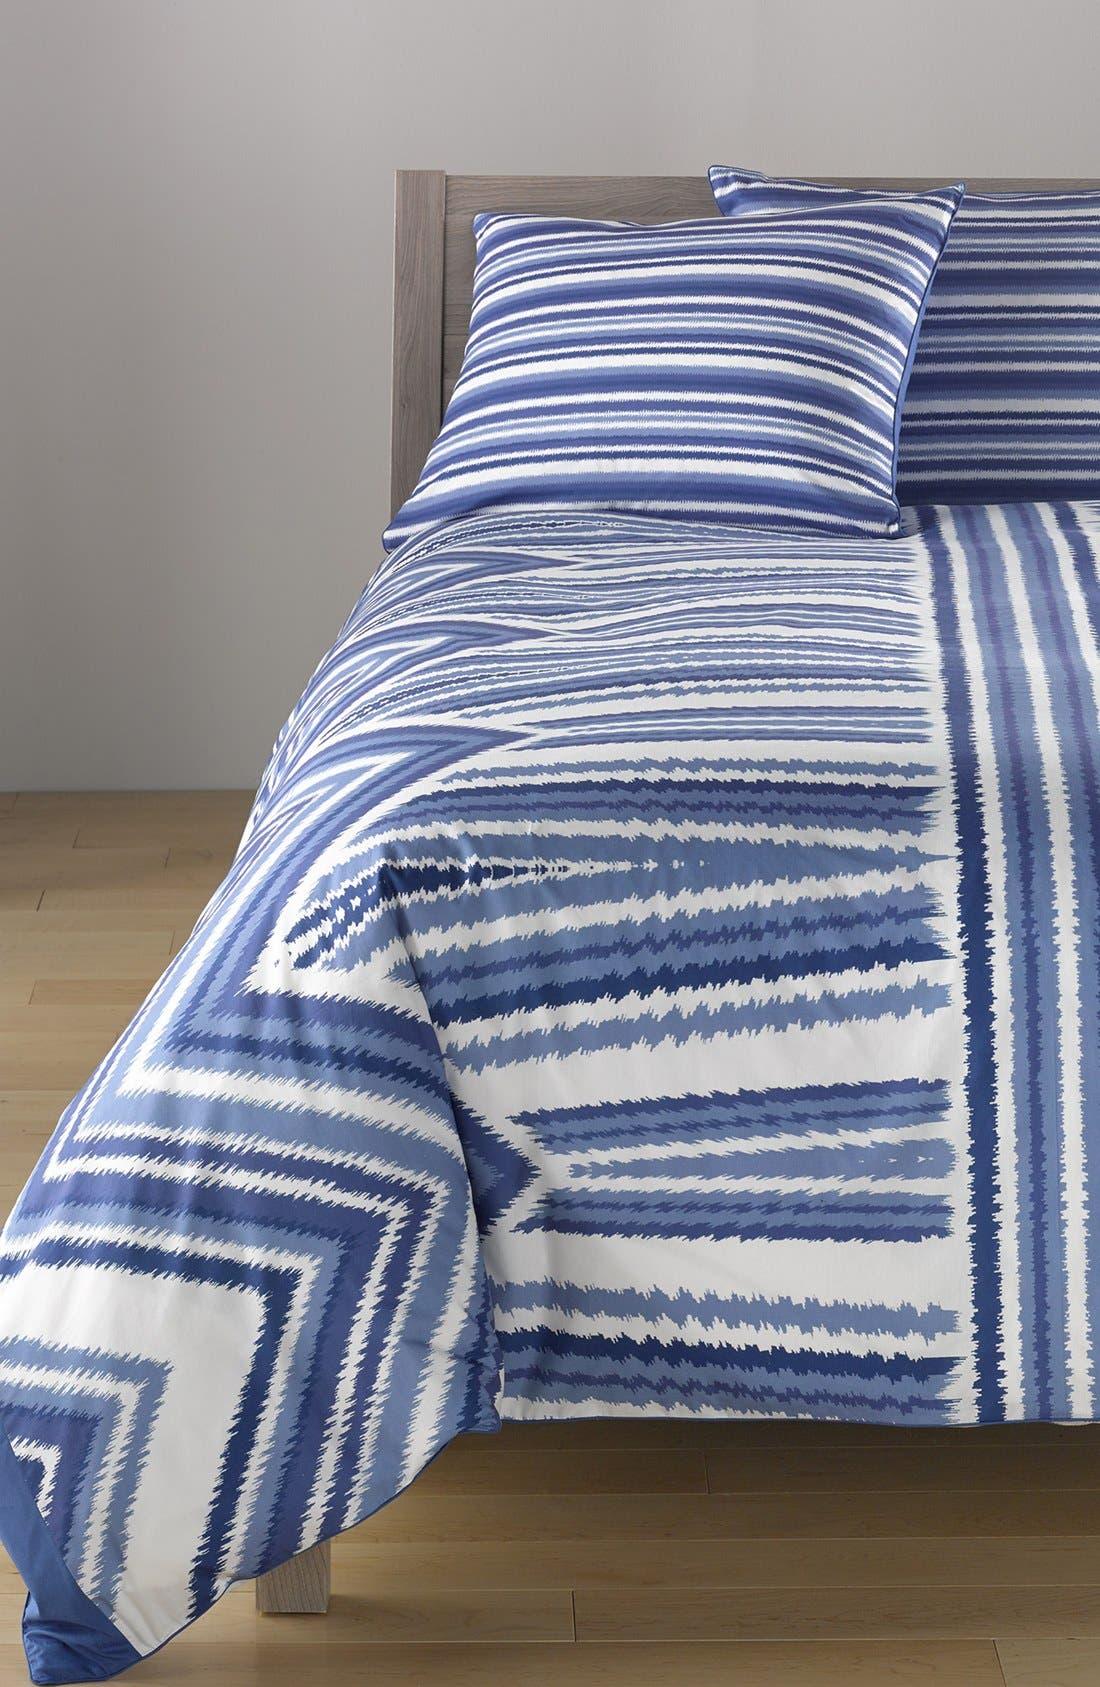 Alternate Image 1 Selected - Nostalgia Home 'Shay' Cotton Duvet Cover